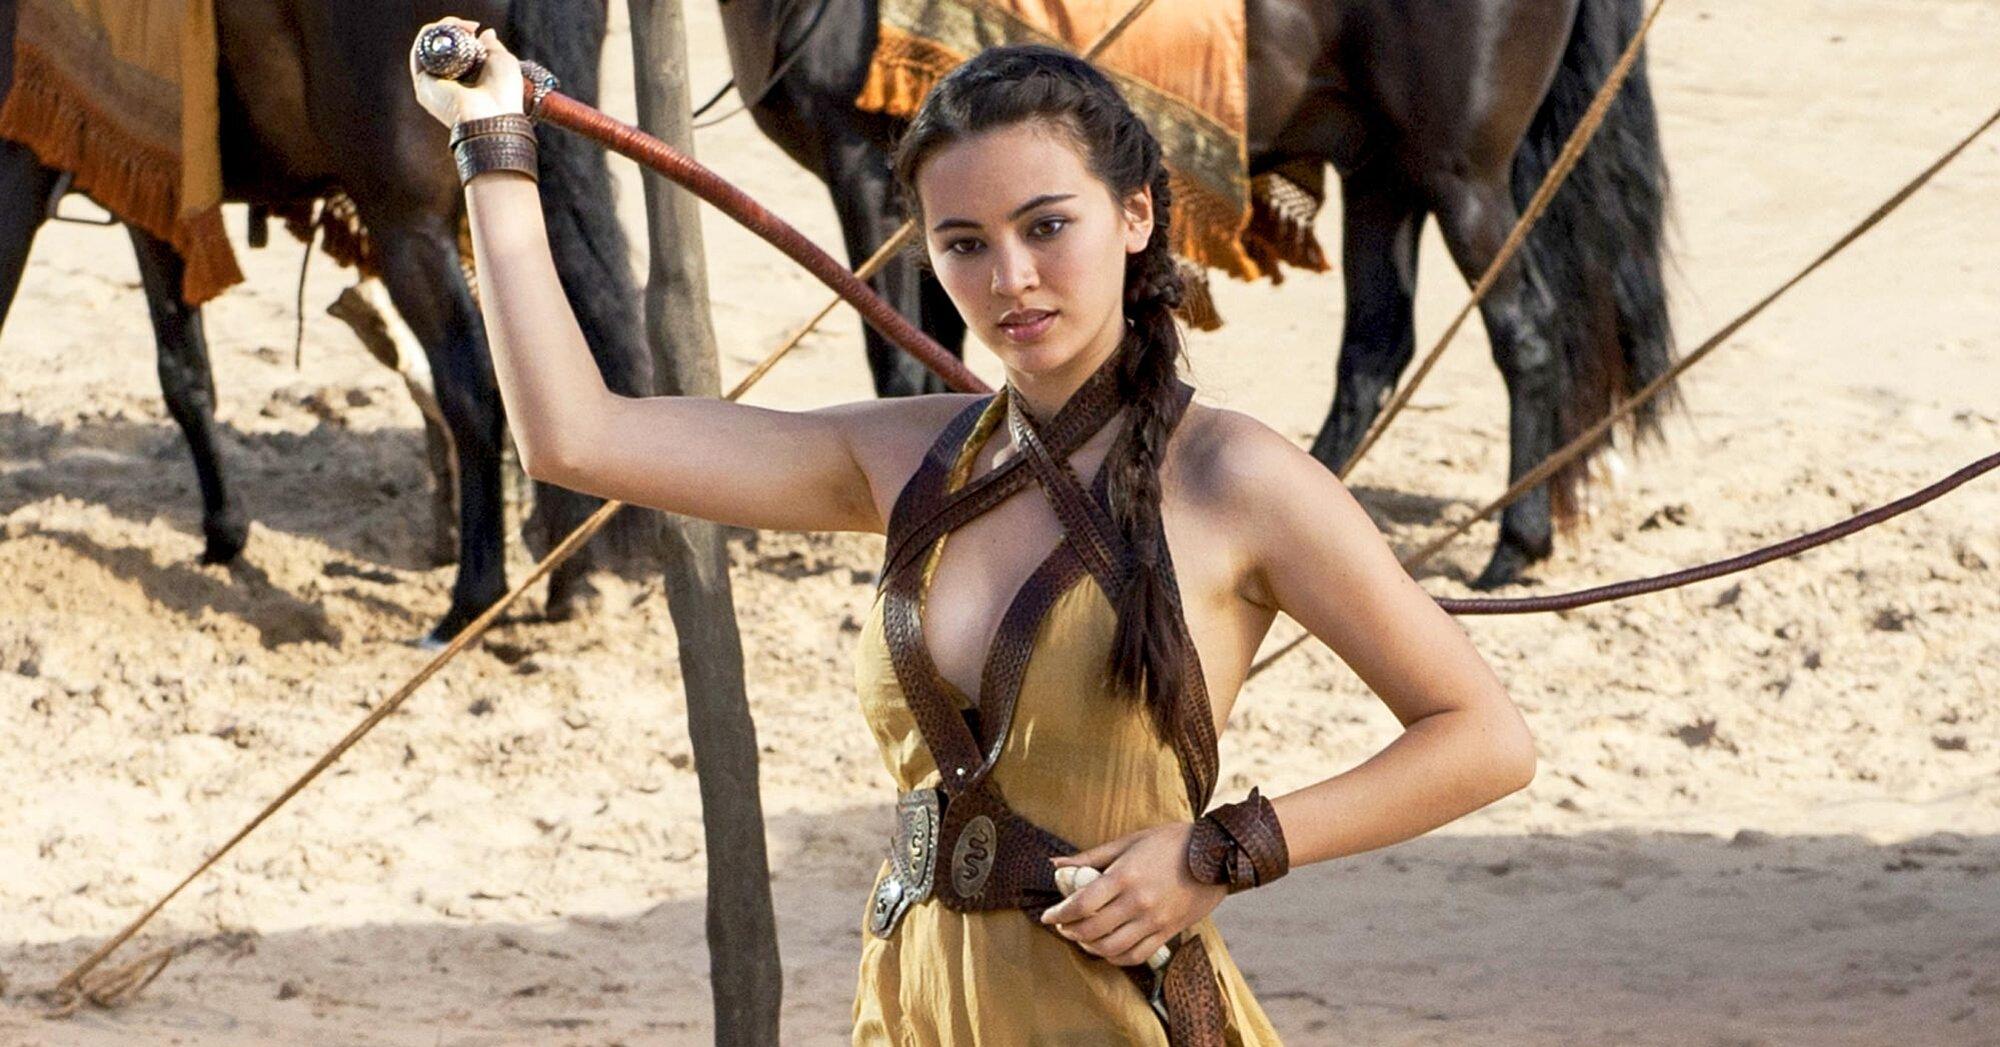 Game of Thrones: Jessica Henwick breaks silence on season